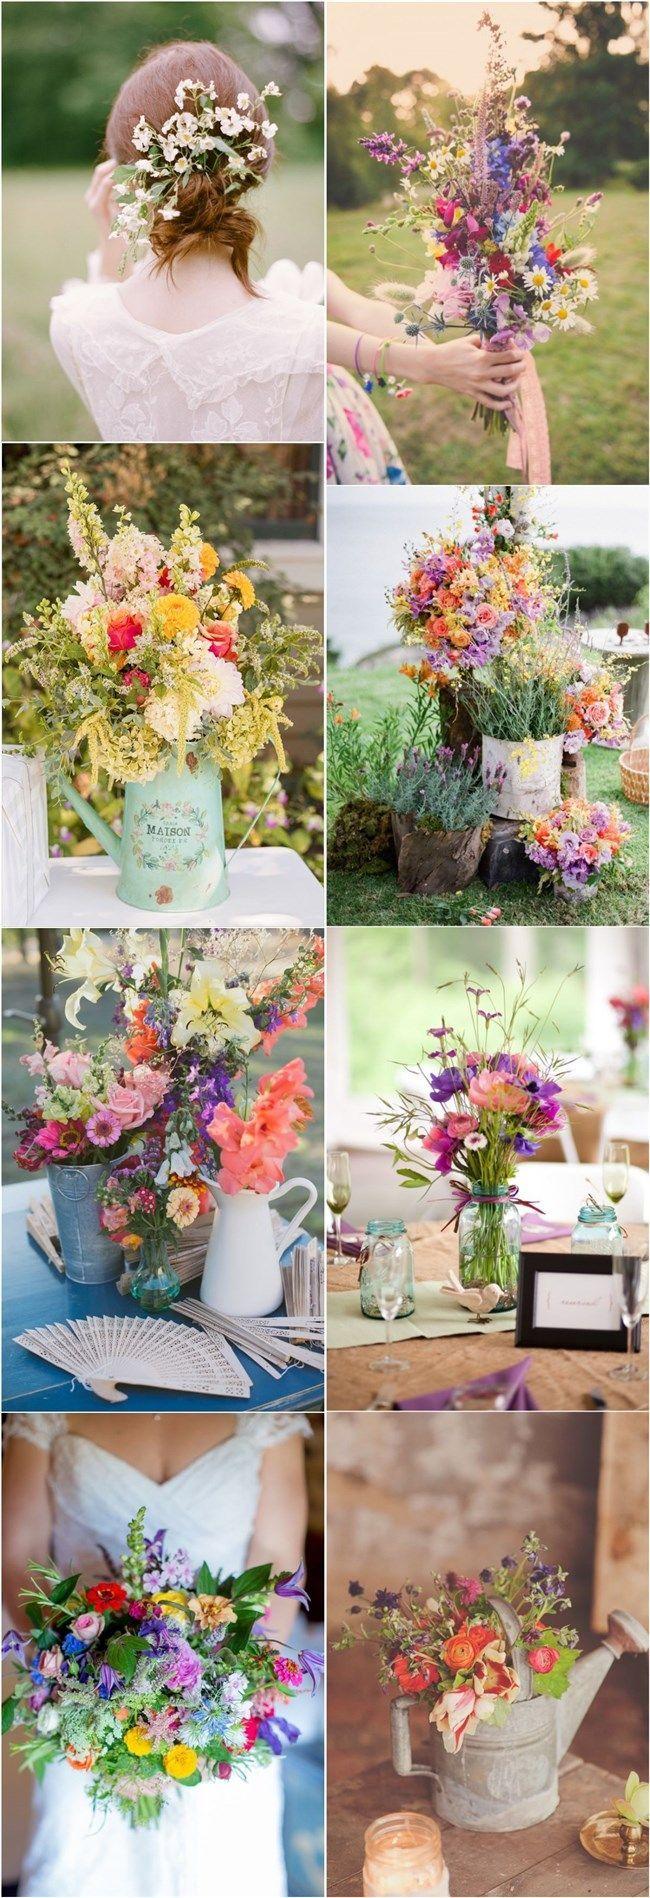 Bodas flores silvestres fotografia de bodas pinterest